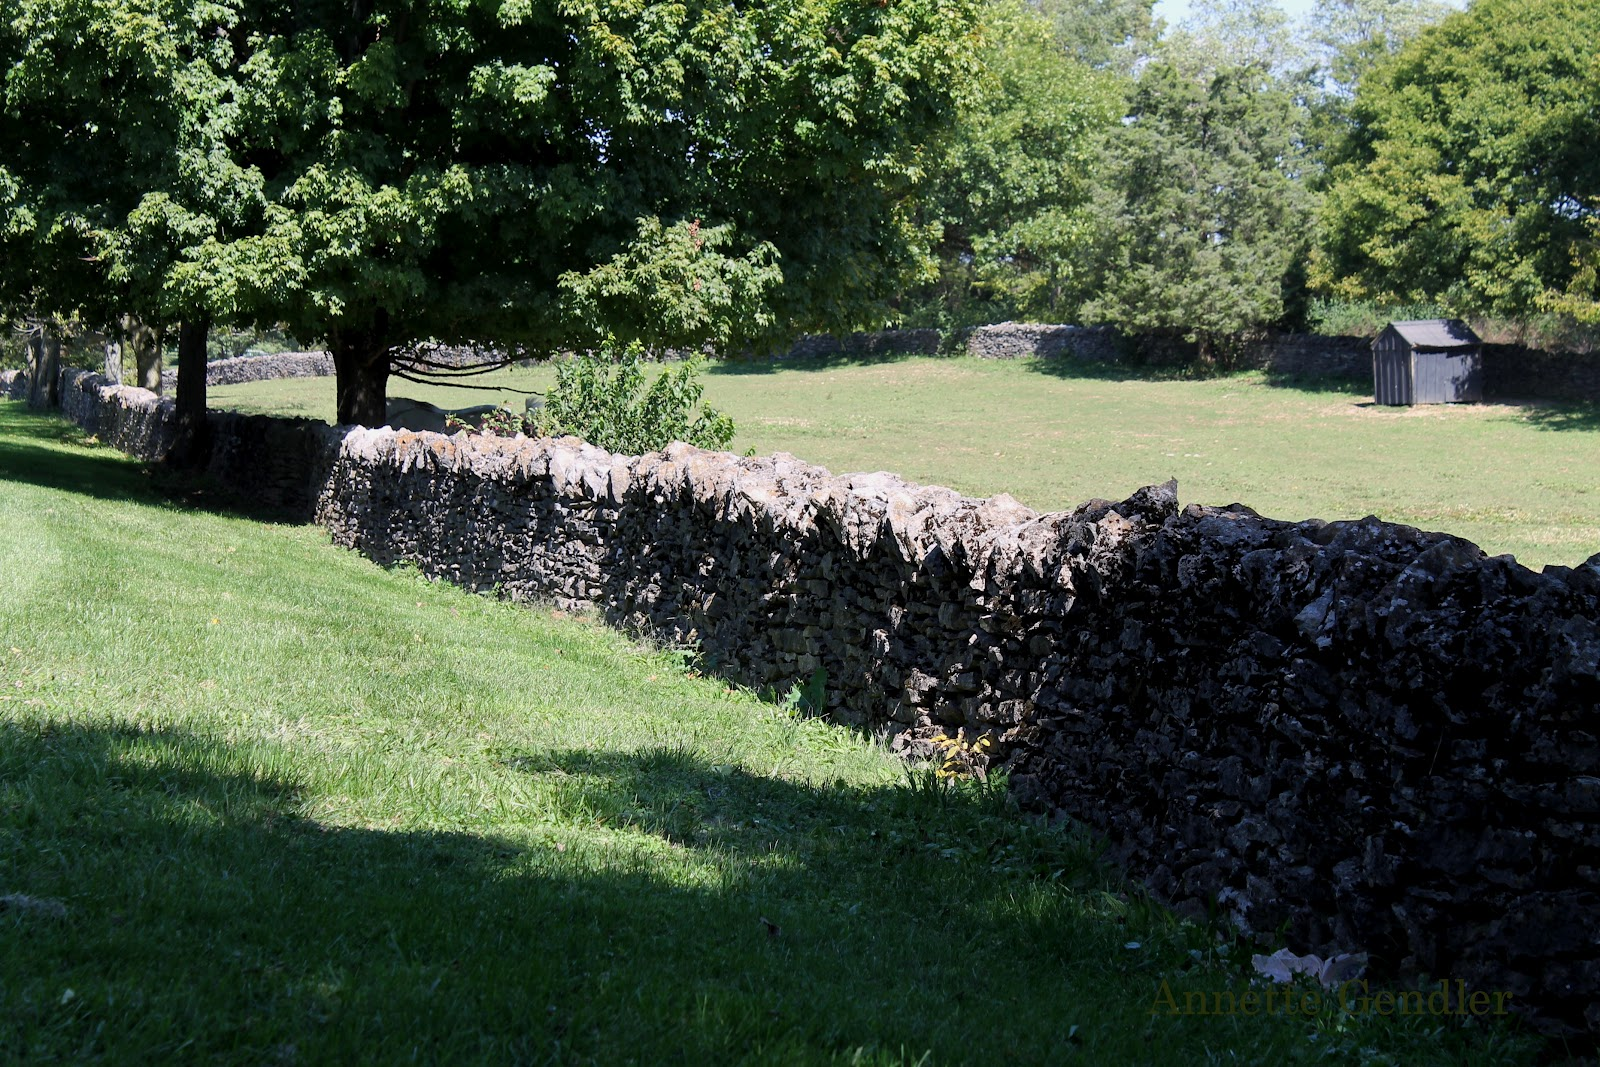 annette gendler  photo essay  stone fences in kentuckyphoto essay  stone fences in kentucky